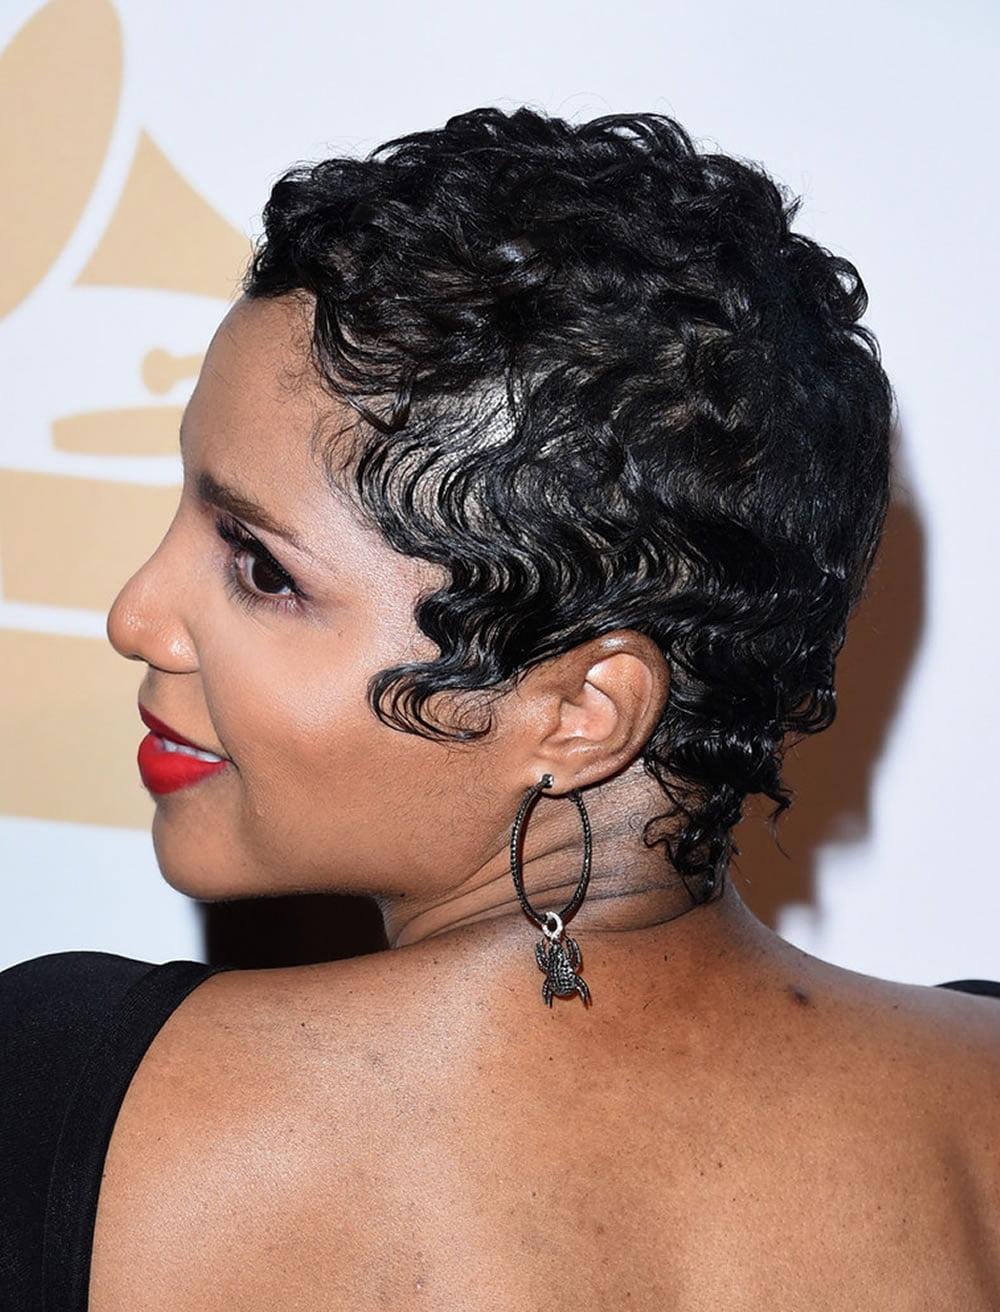 Summer hair 2019 pixie hairstyle ideas for black women - Hair Colors